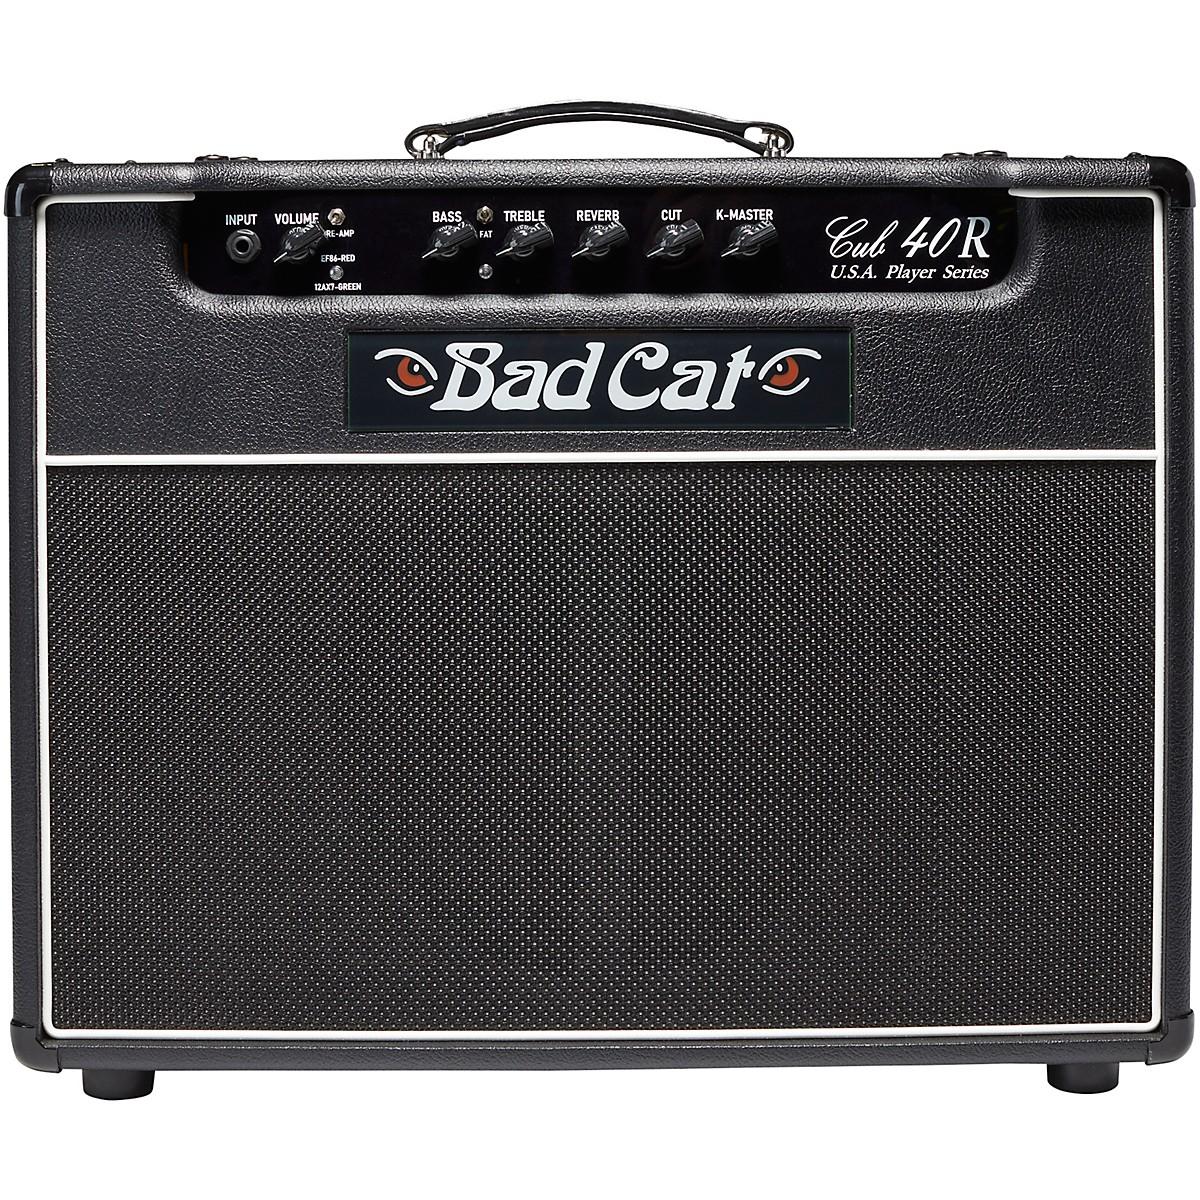 Bad Cat Cub 40R USA Player Series 40W 1x12 Tube Guitar Combo Amp